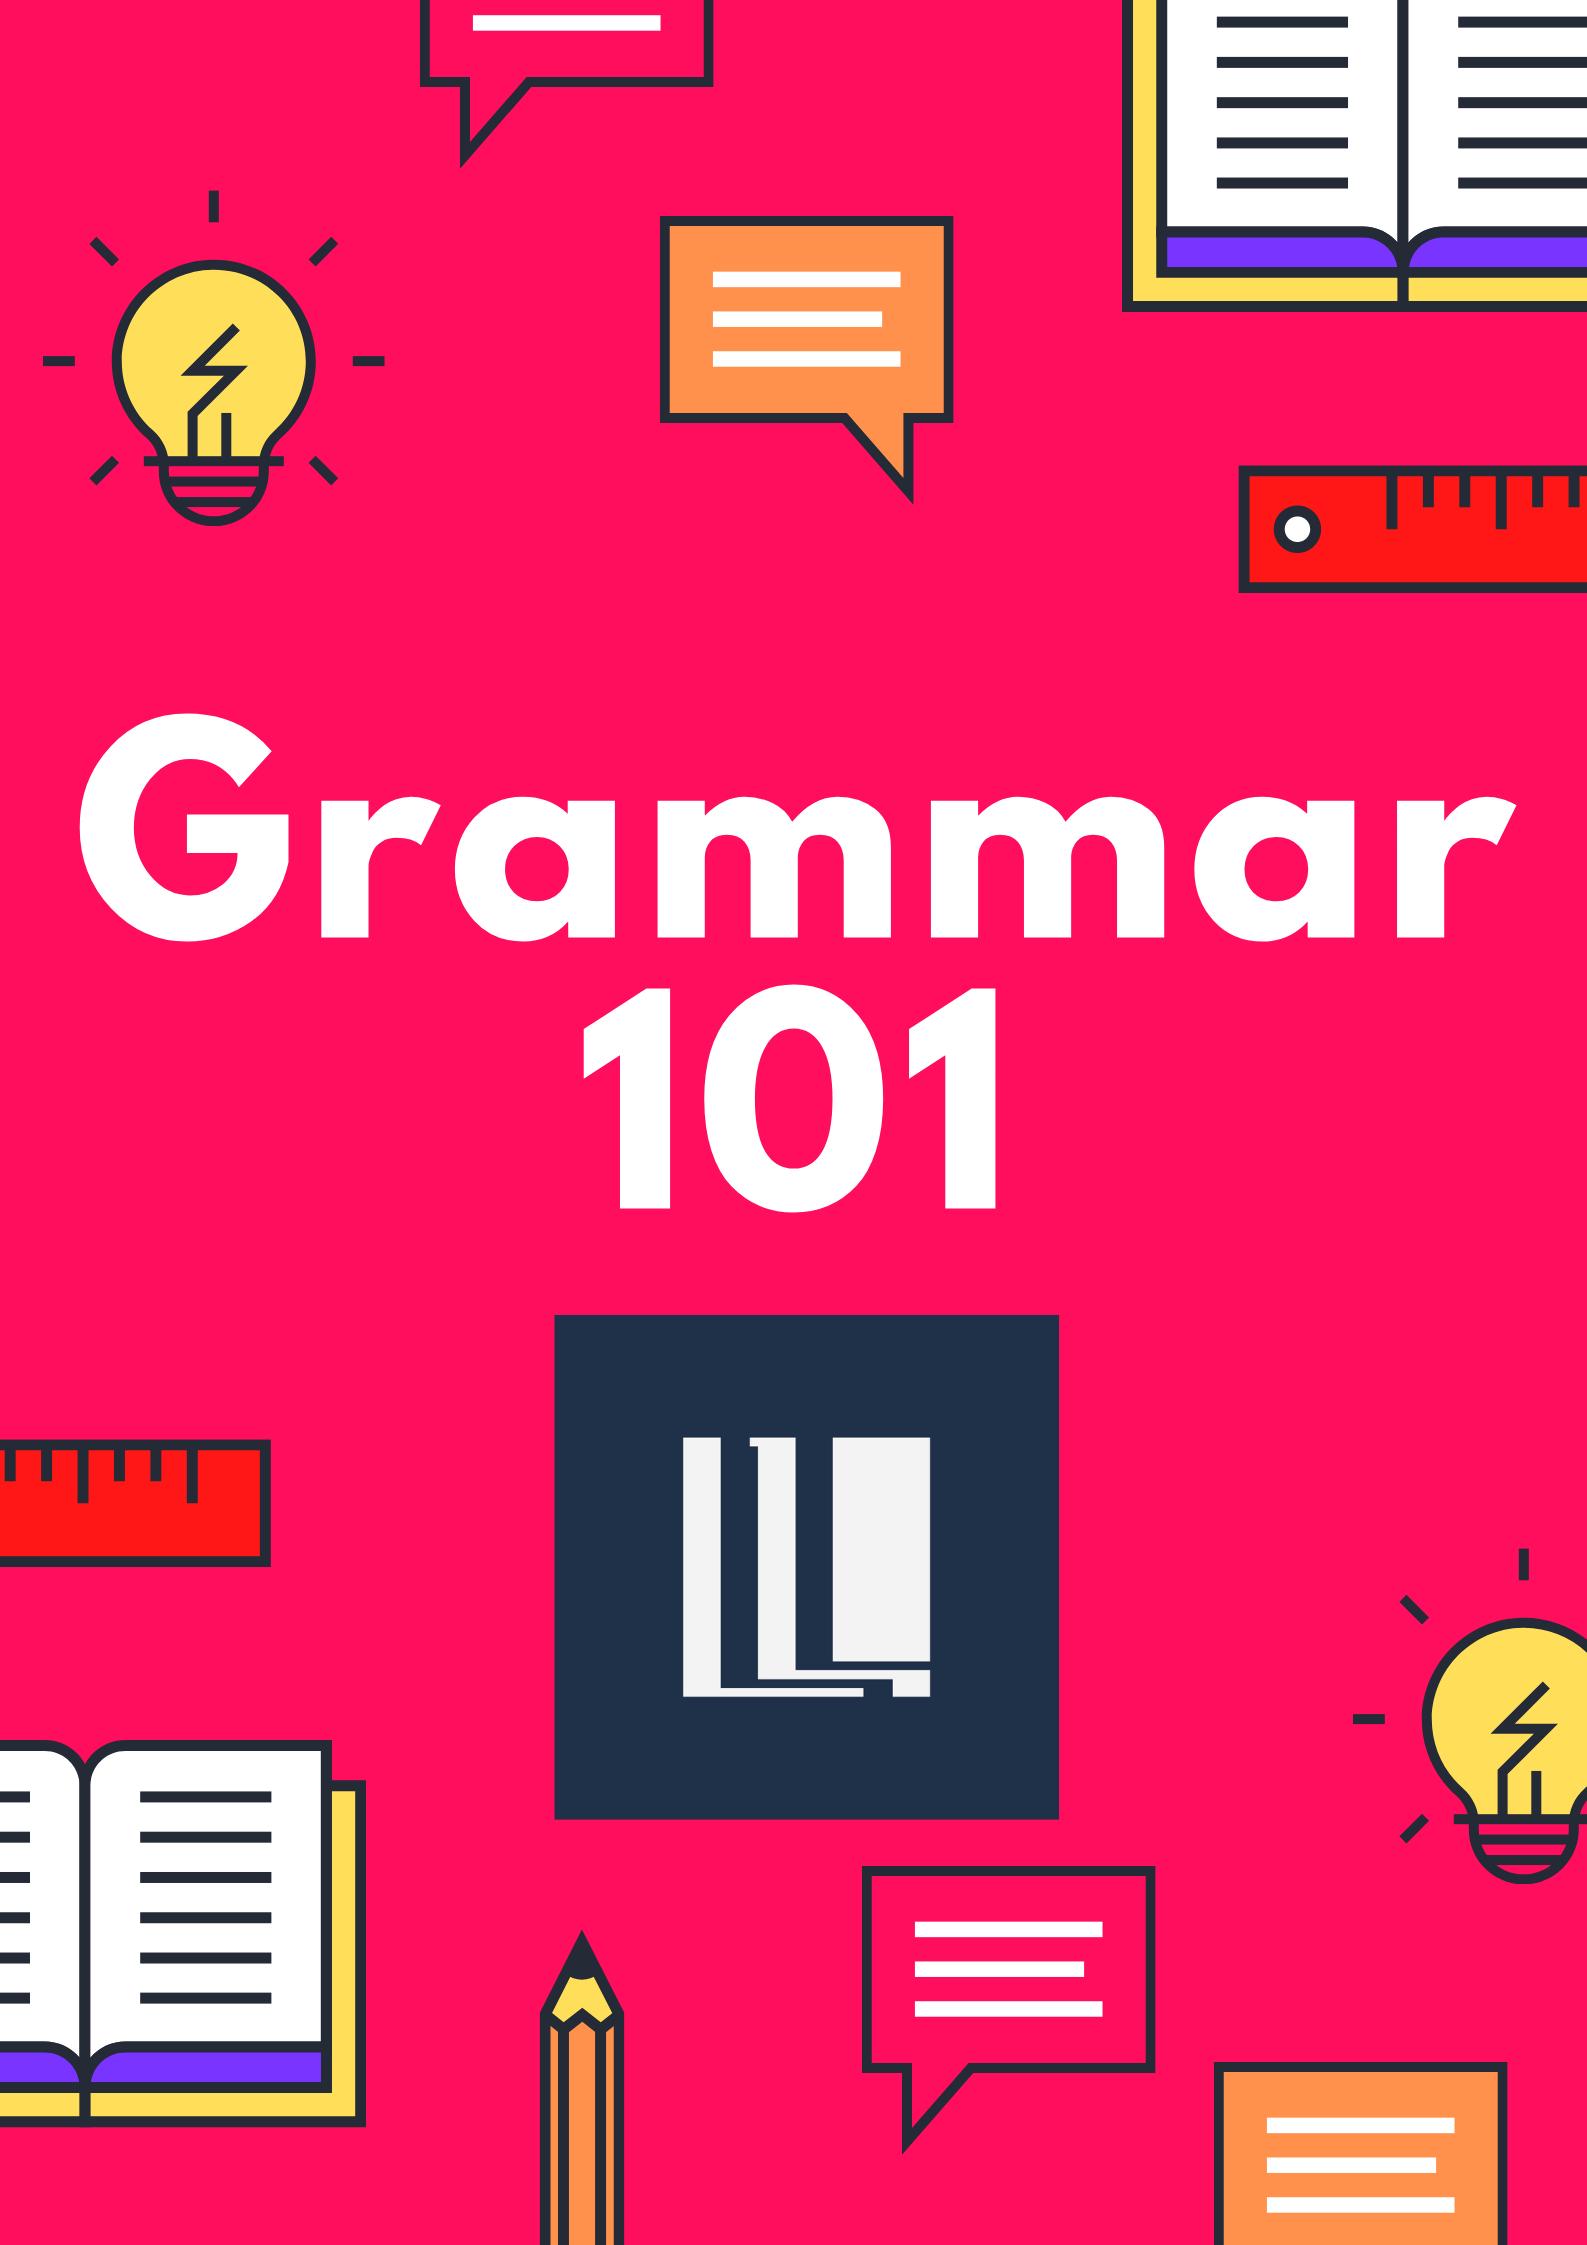 Grammar 101 Part 3 (October 2020)